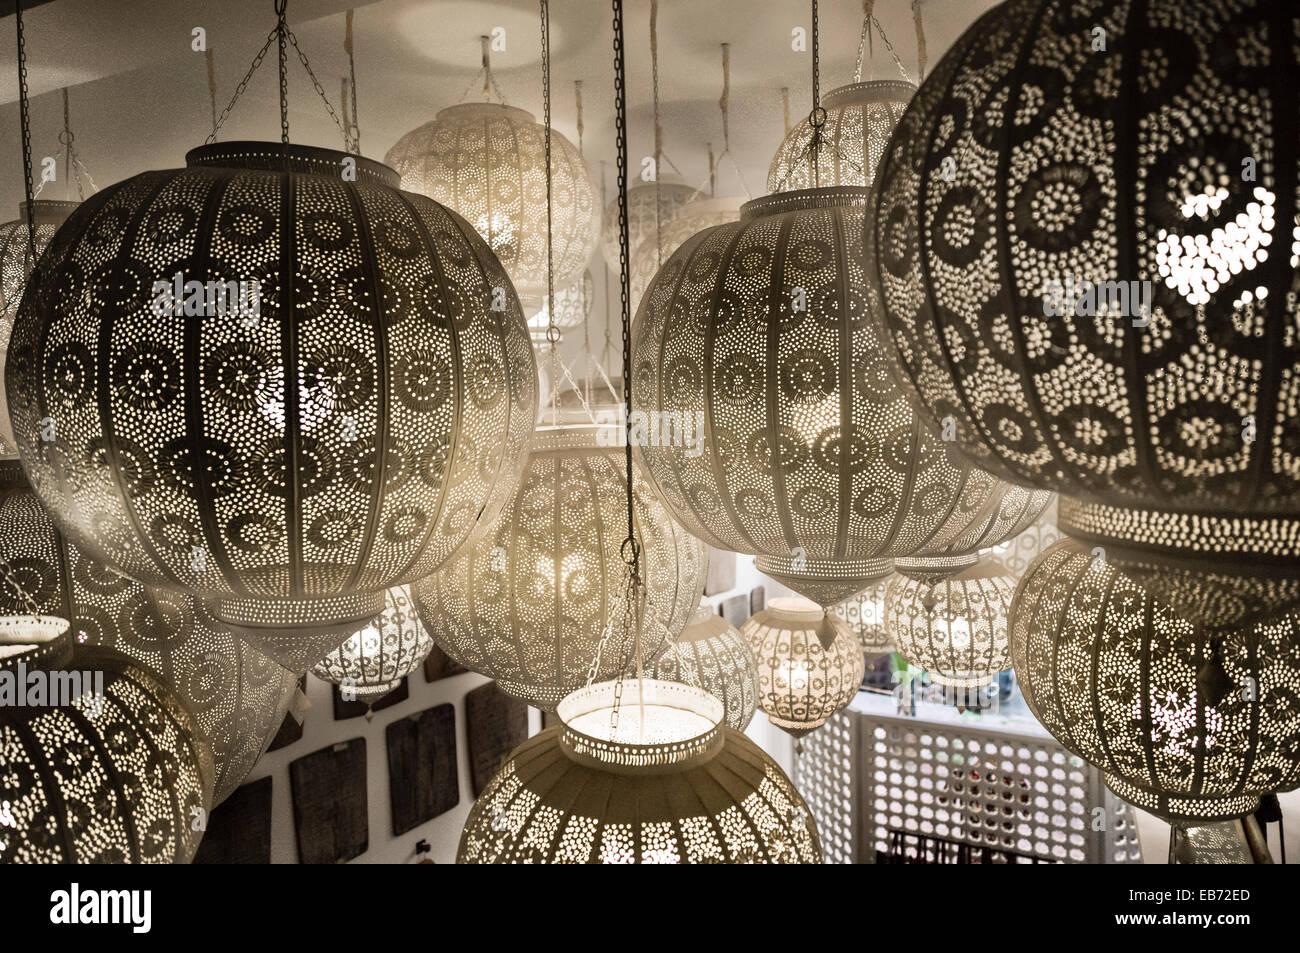 Moroccan lamps marrakesh morocco art lighting stock photo 75758325 moroccan lamps marrakesh morocco art lighting arubaitofo Image collections